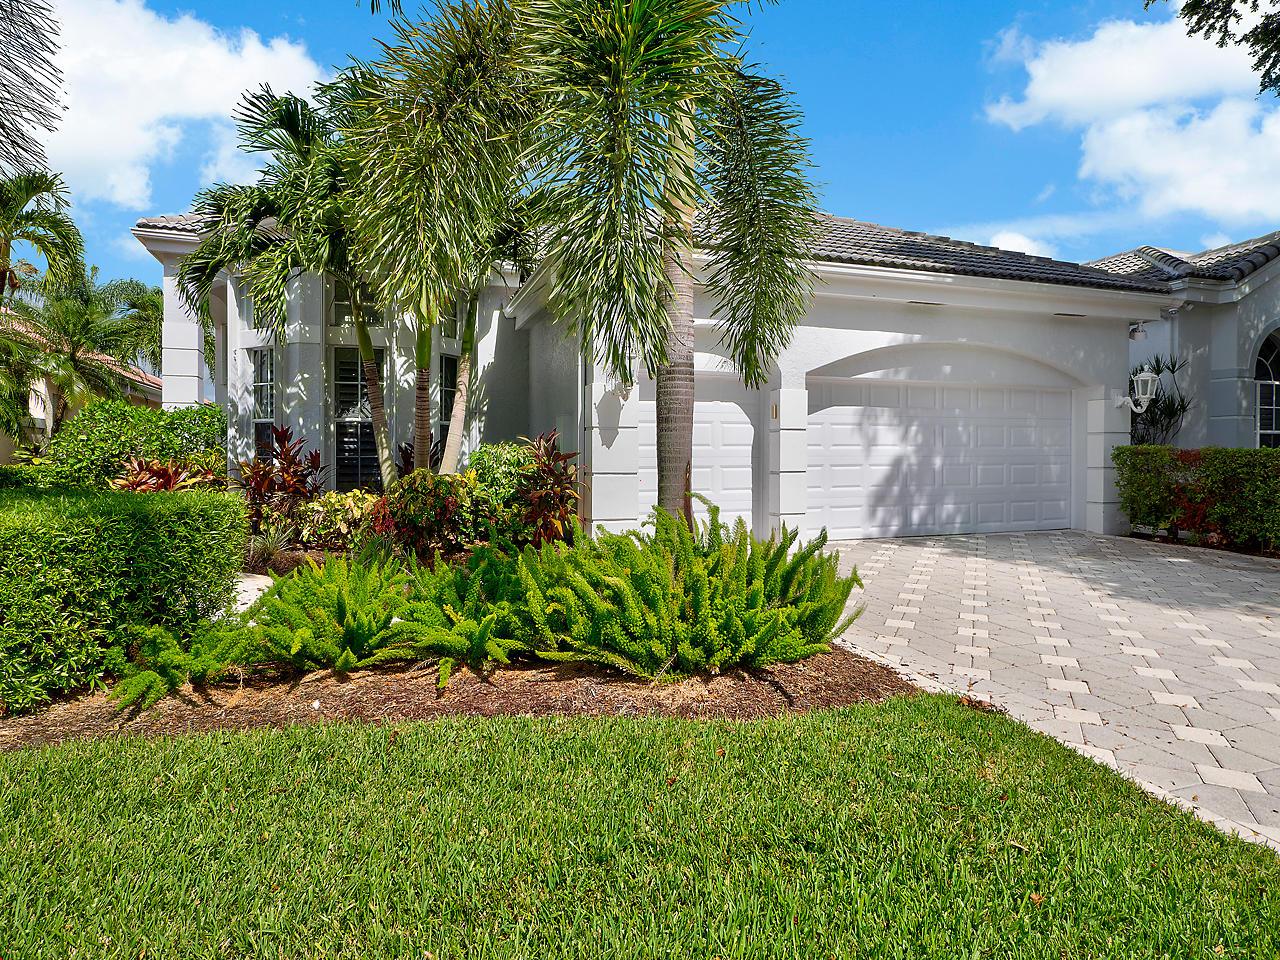 166 Windward Drive, Palm Beach Gardens, Florida 33418, 3 Bedrooms Bedrooms, ,4 BathroomsBathrooms,A,Single family,Windward,RX-10472794